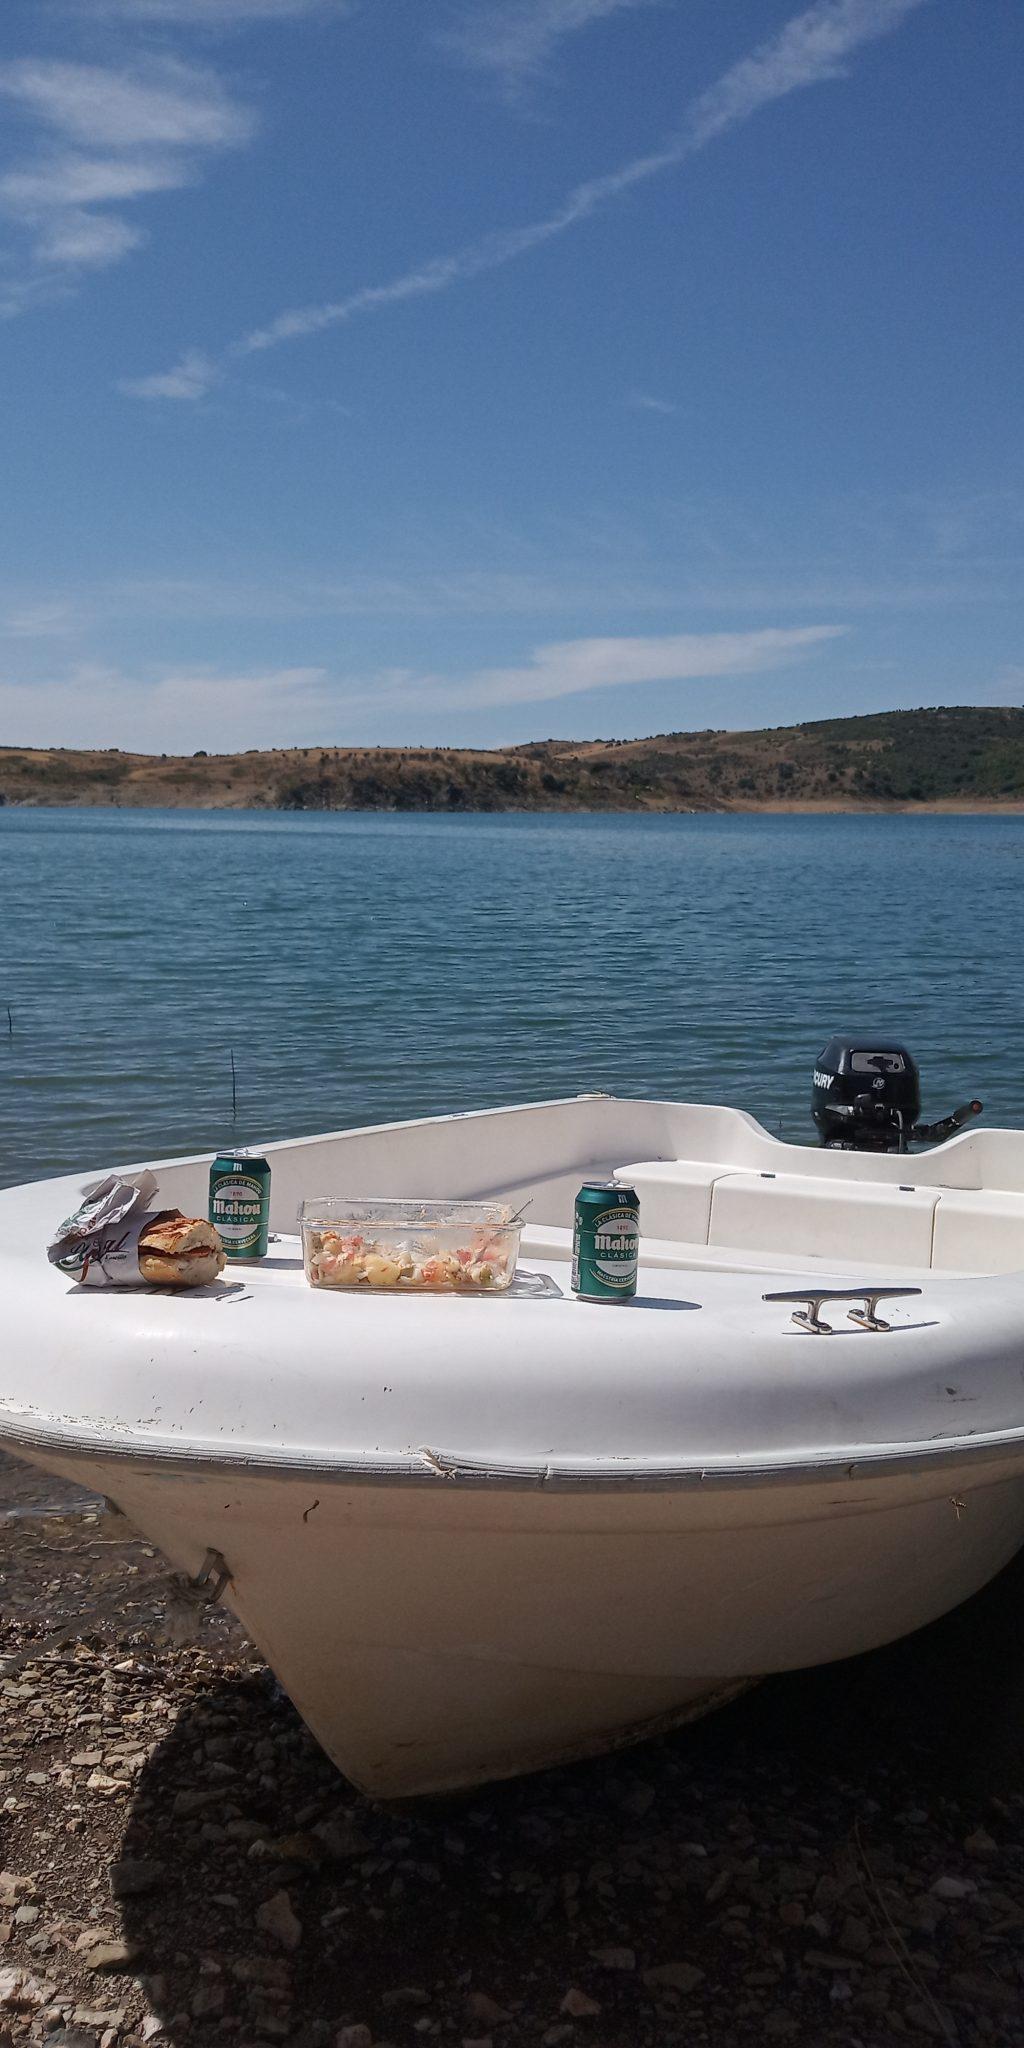 actividades acuáticas en Ricobayo Zamora